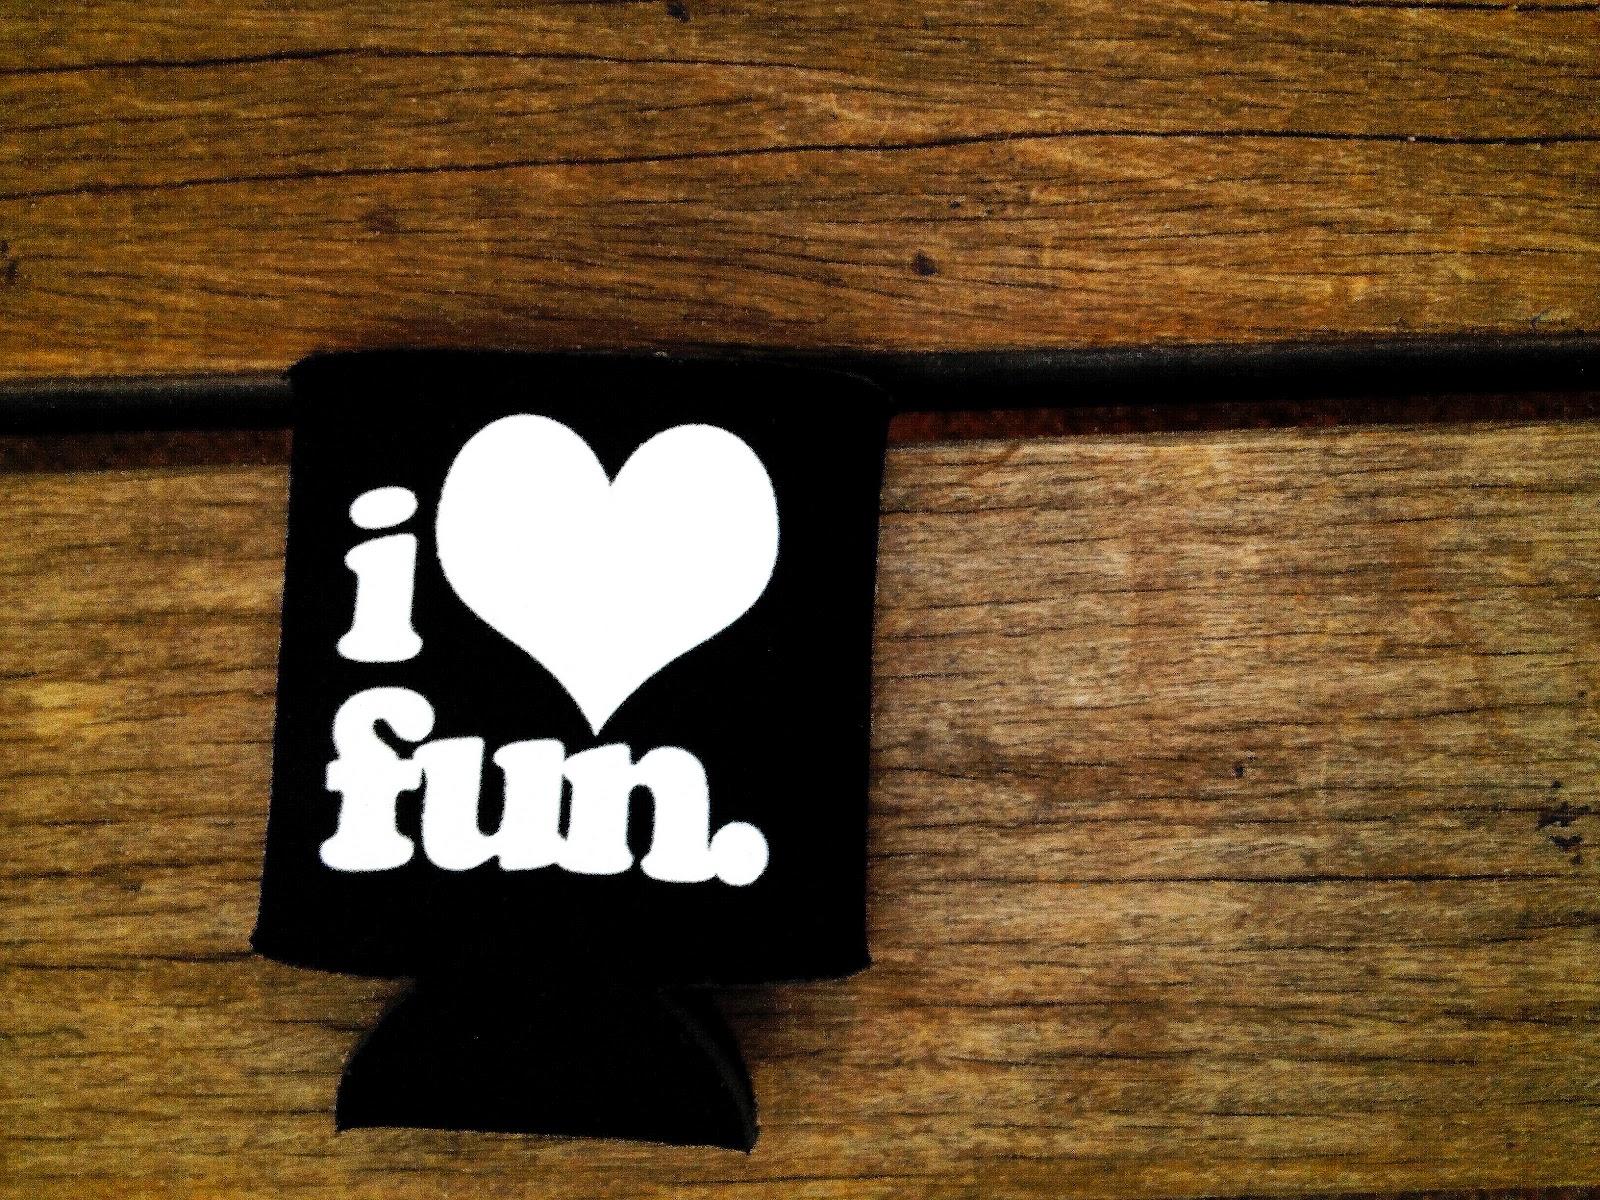 http://4.bp.blogspot.com/-Tx6FB1fsFF4/T_EPNVbmxiI/AAAAAAAABO0/cTgzzmYJqEw/s1600/i-love-fun%20copy.jpg